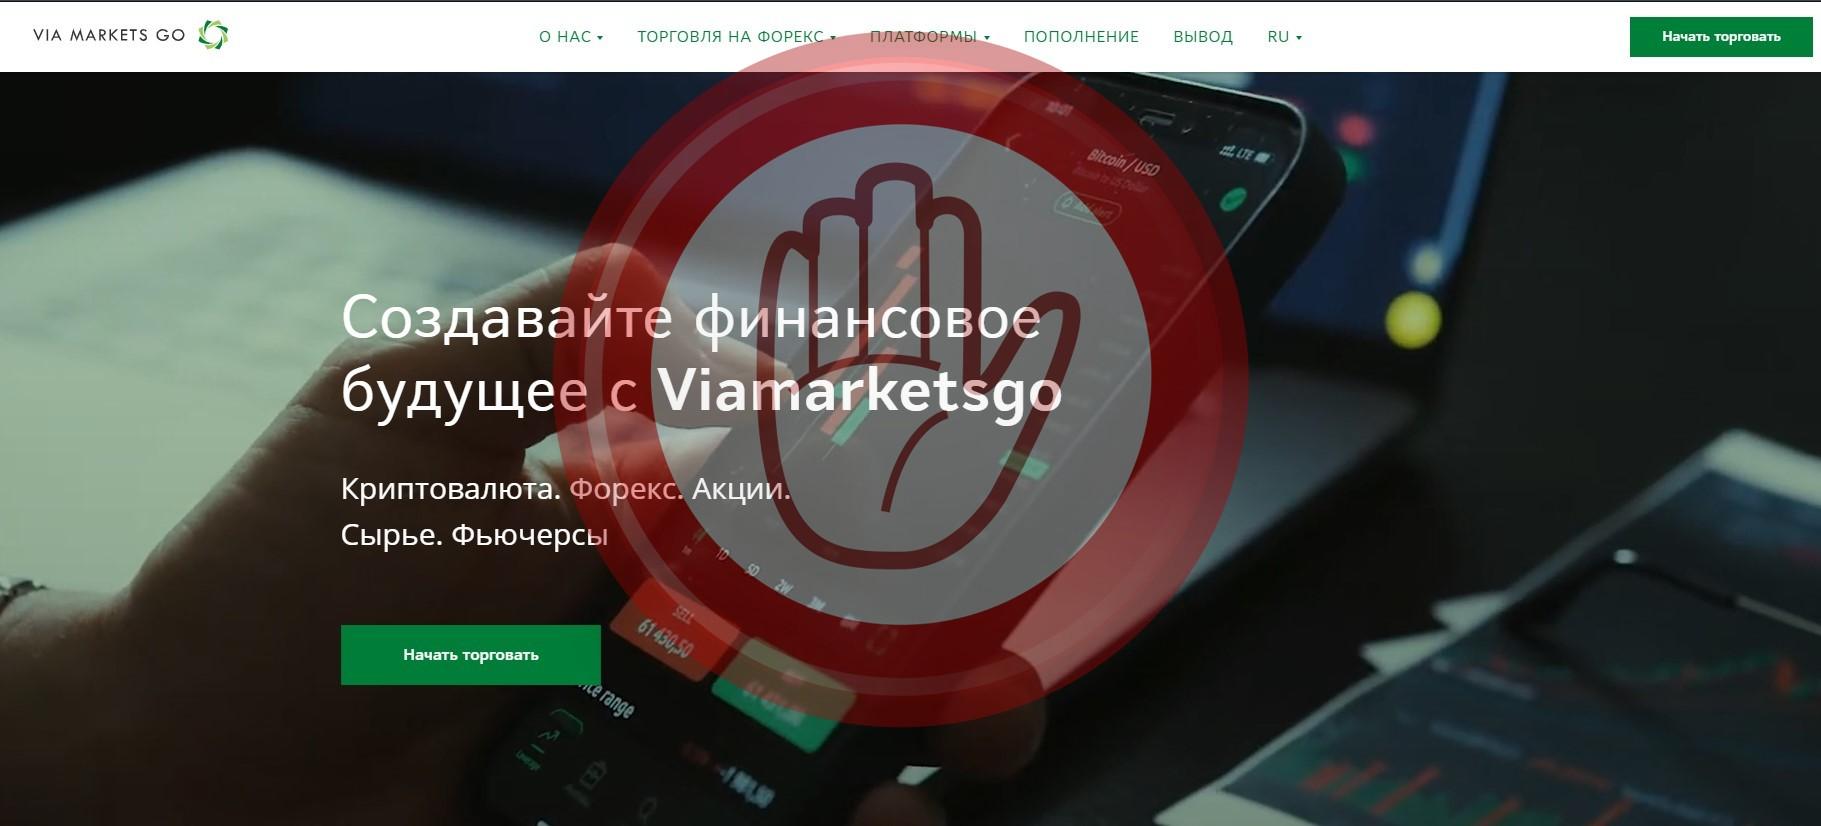 Viamarketsgo — мой кабинет был заблокирован на viamarketsgo.com